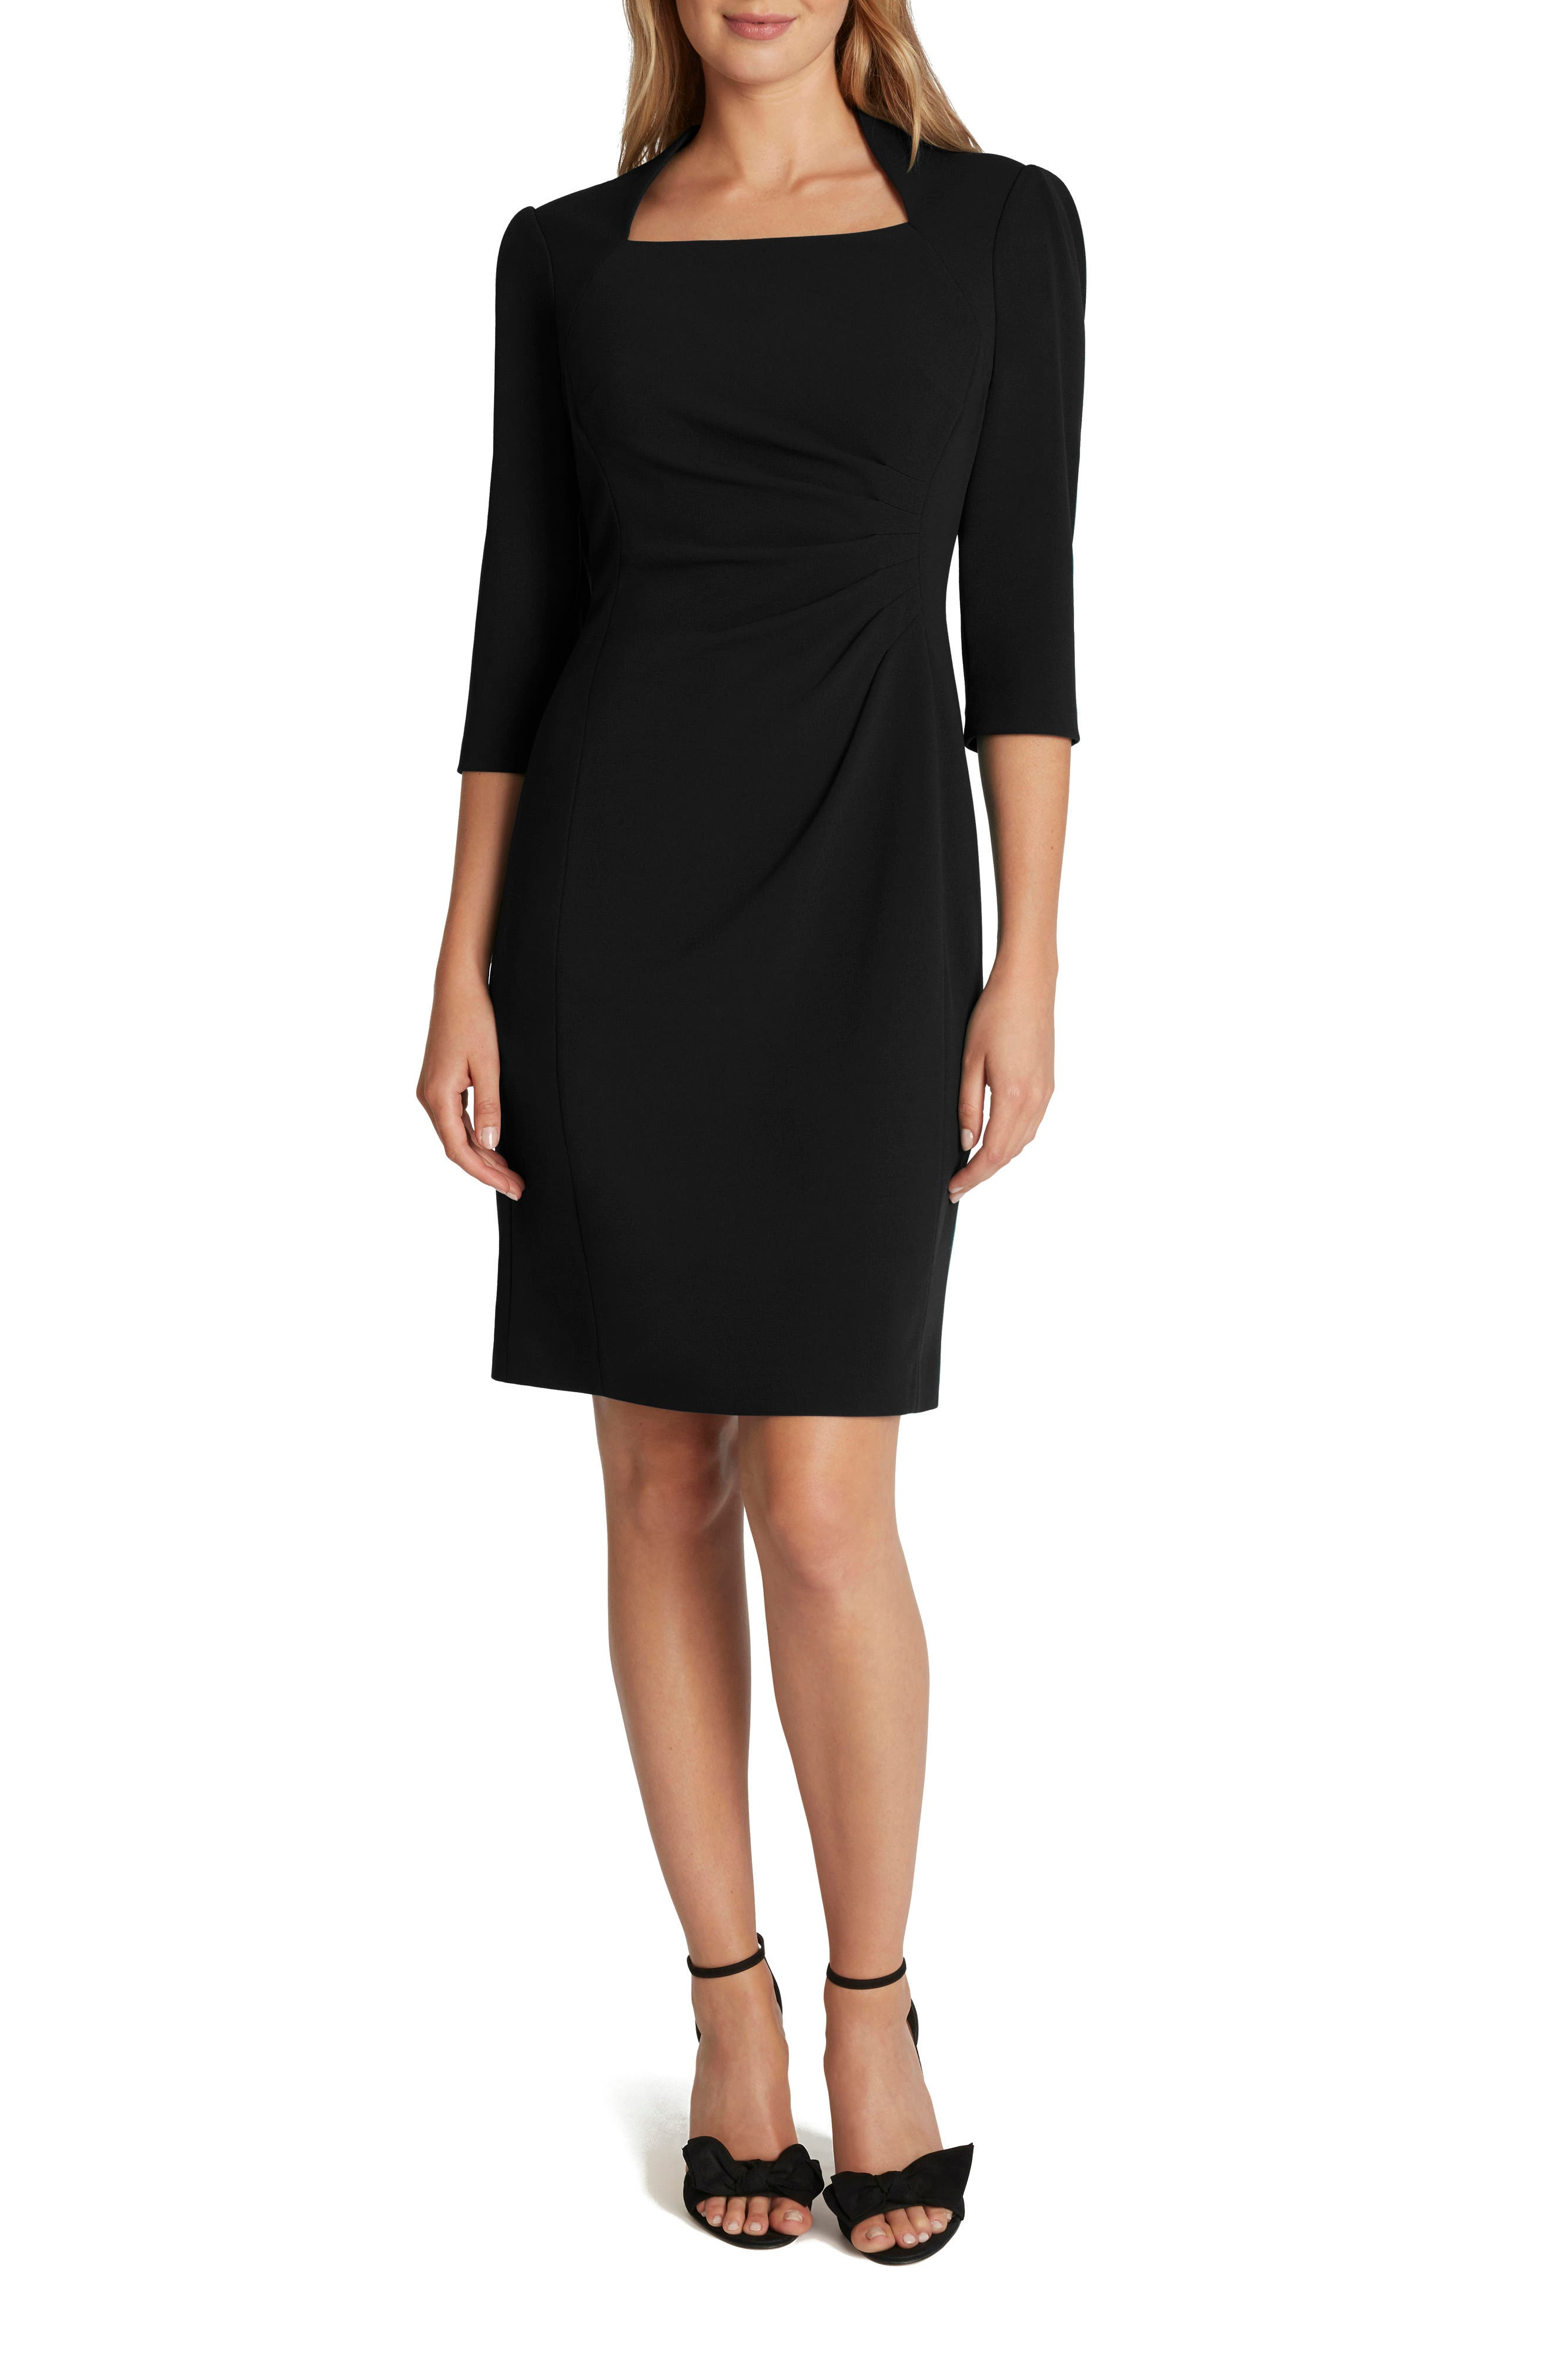 Tahari Square Neck Sheath Dress | Nordstrom